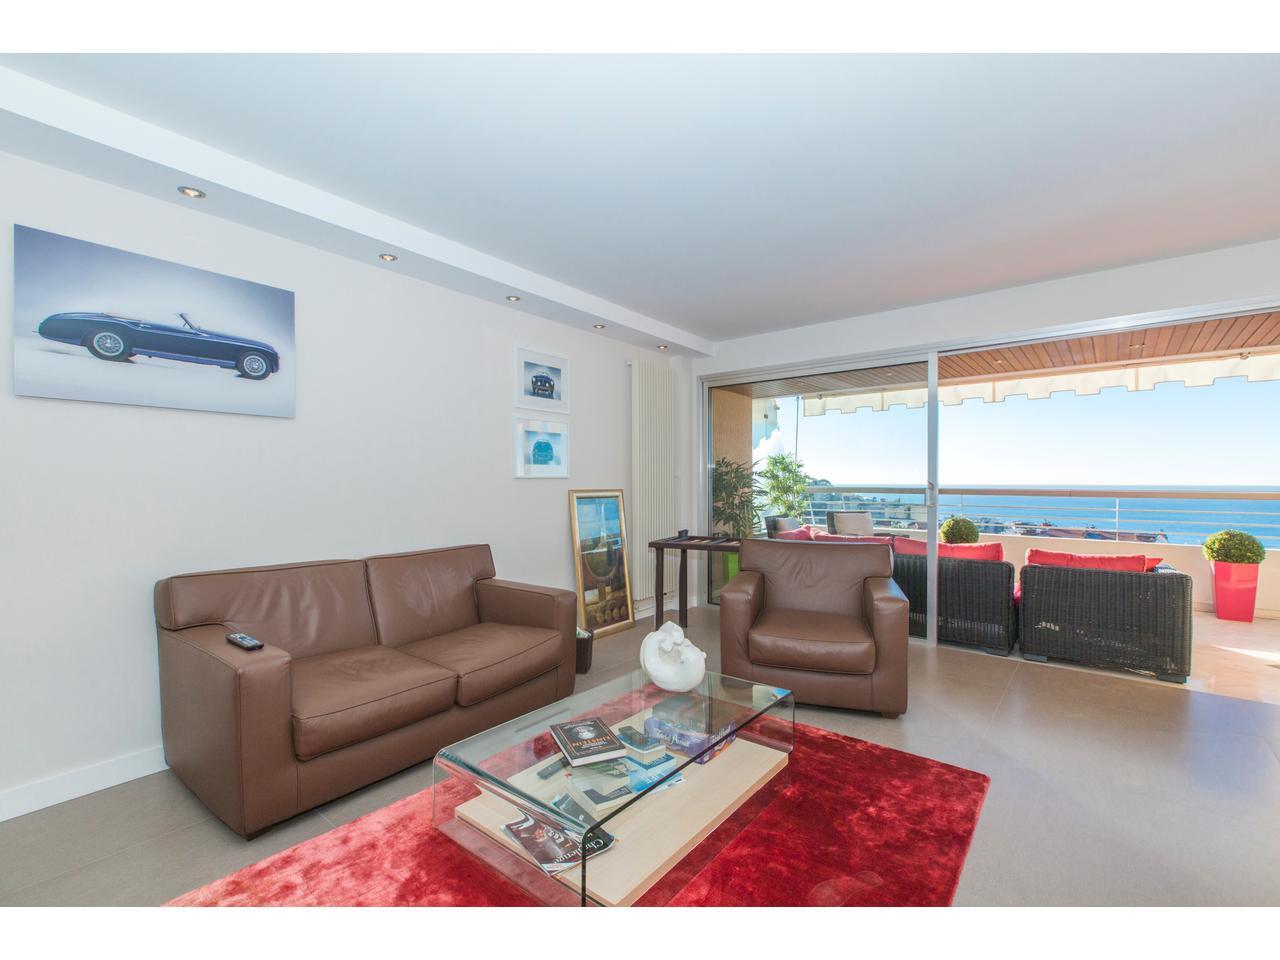 Immobilier nice vue mer appartement nice mont boron 3 - Appartement a vendre port vendres vue mer ...